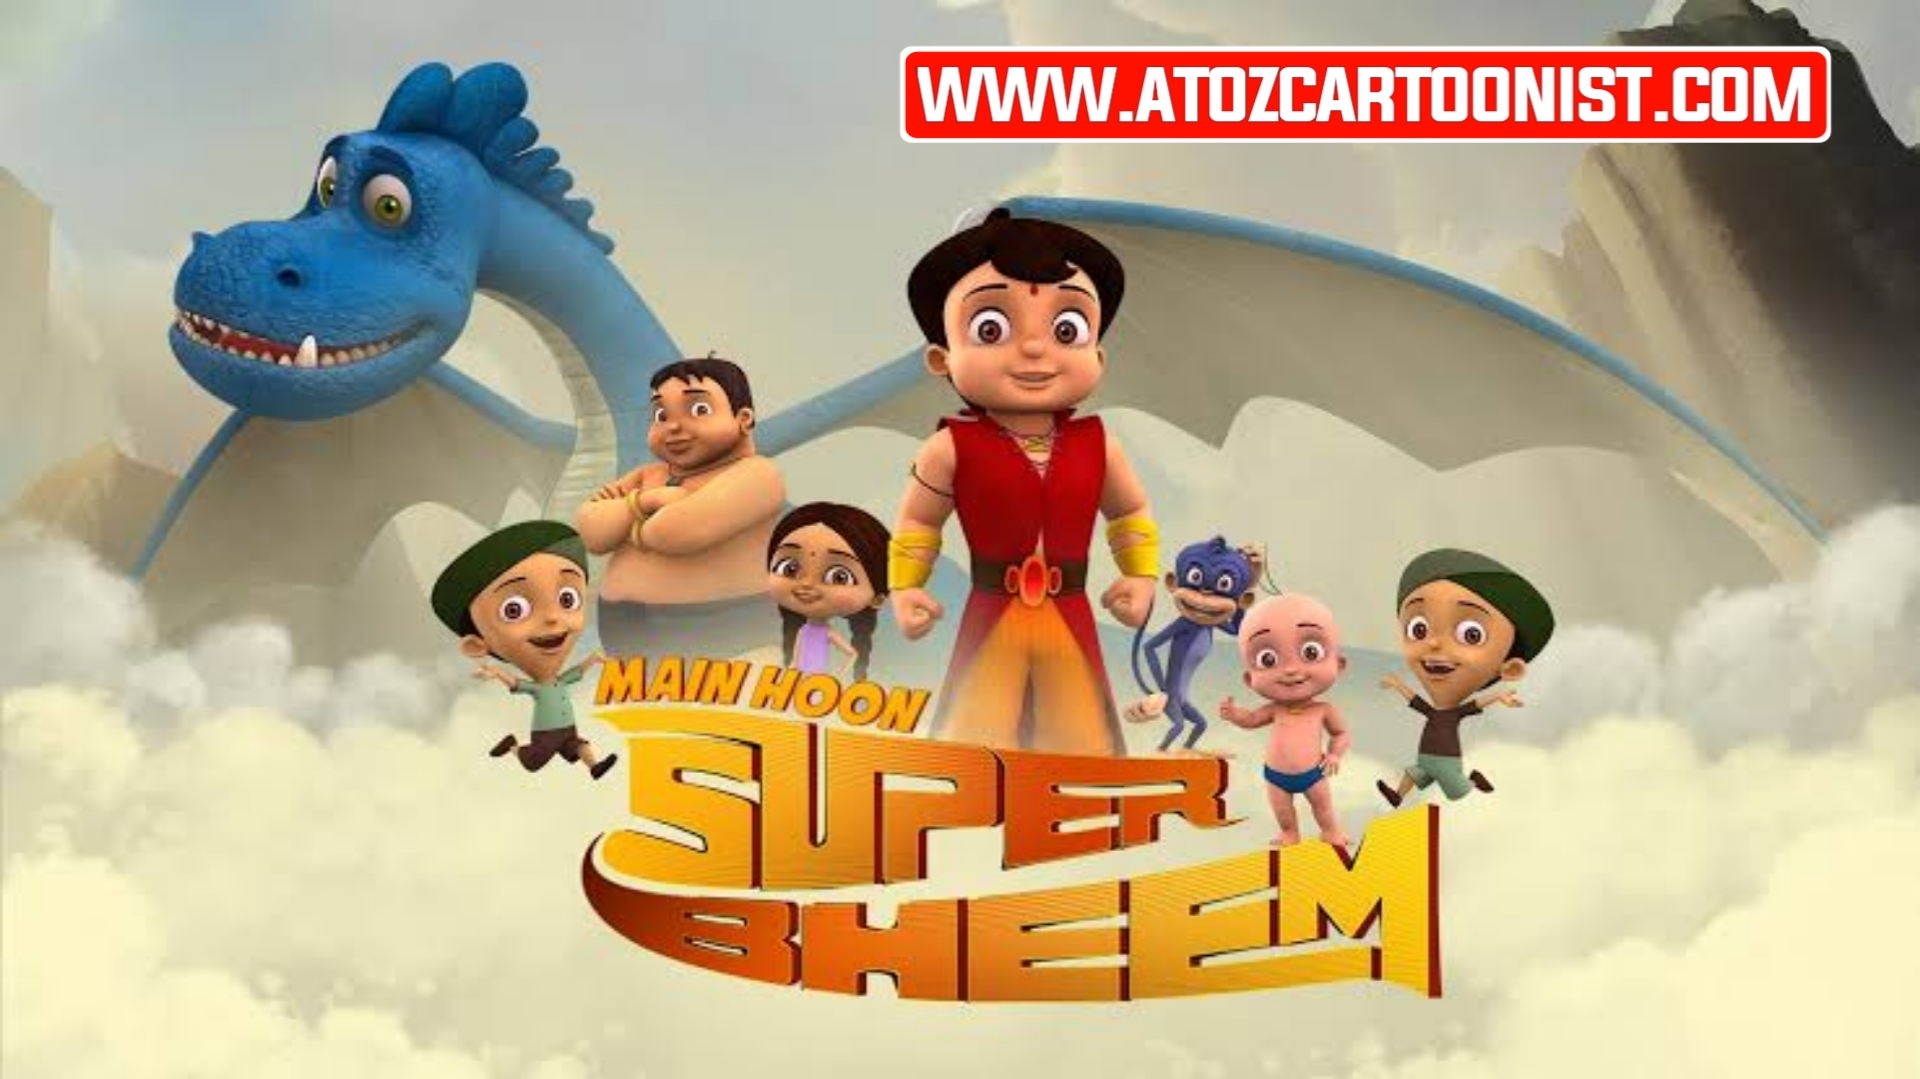 MAIN HOON SUPER BHEEM FULL MOVIE IN HINDI DOWNLOAD (480P HALF HD)